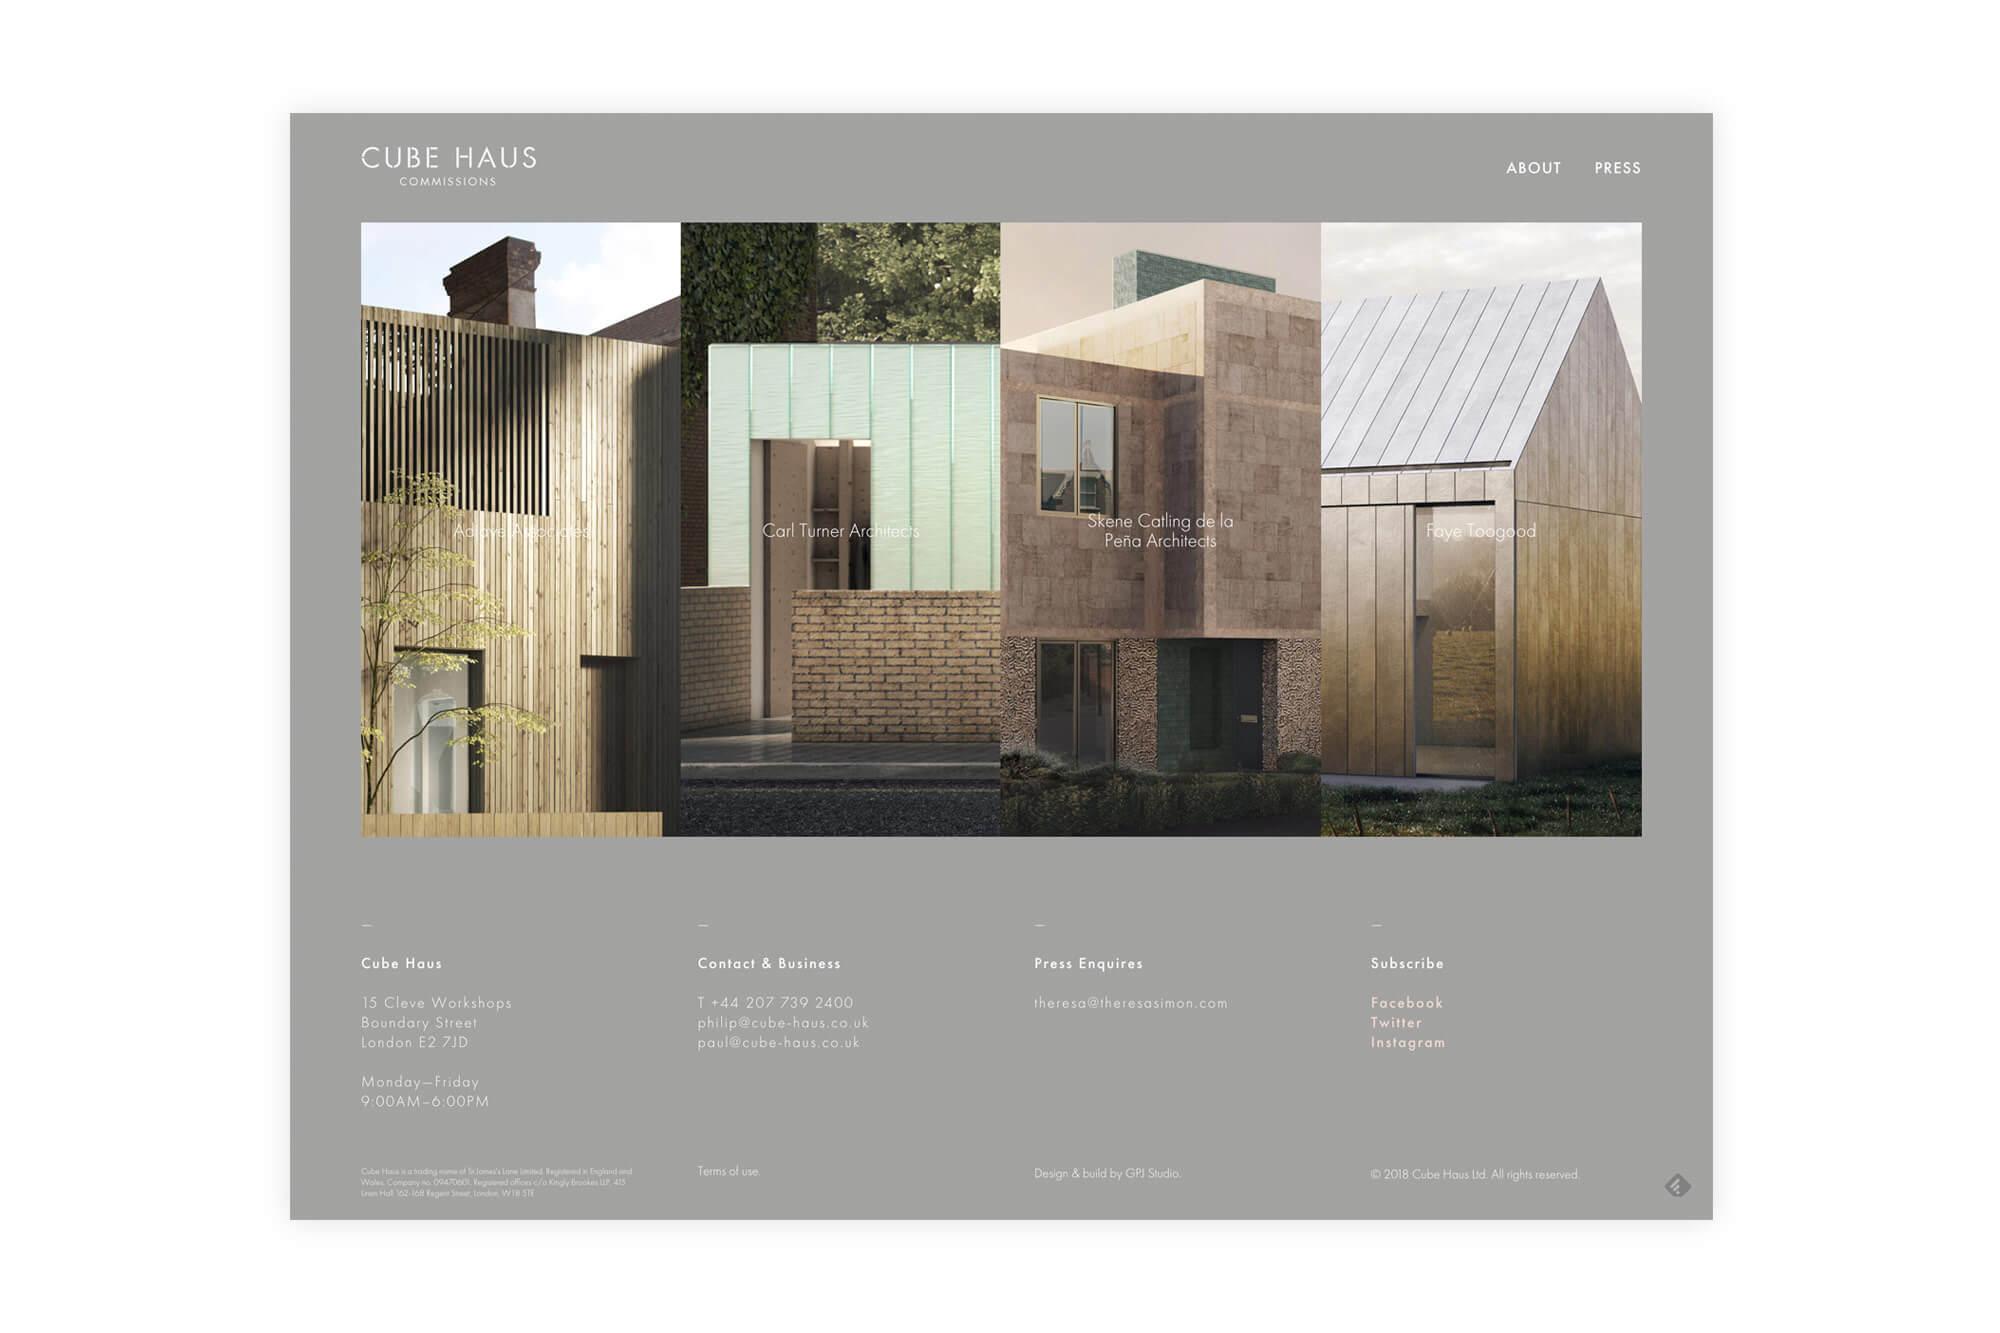 gpj-studio-cube-haus-architects-website-cs-02